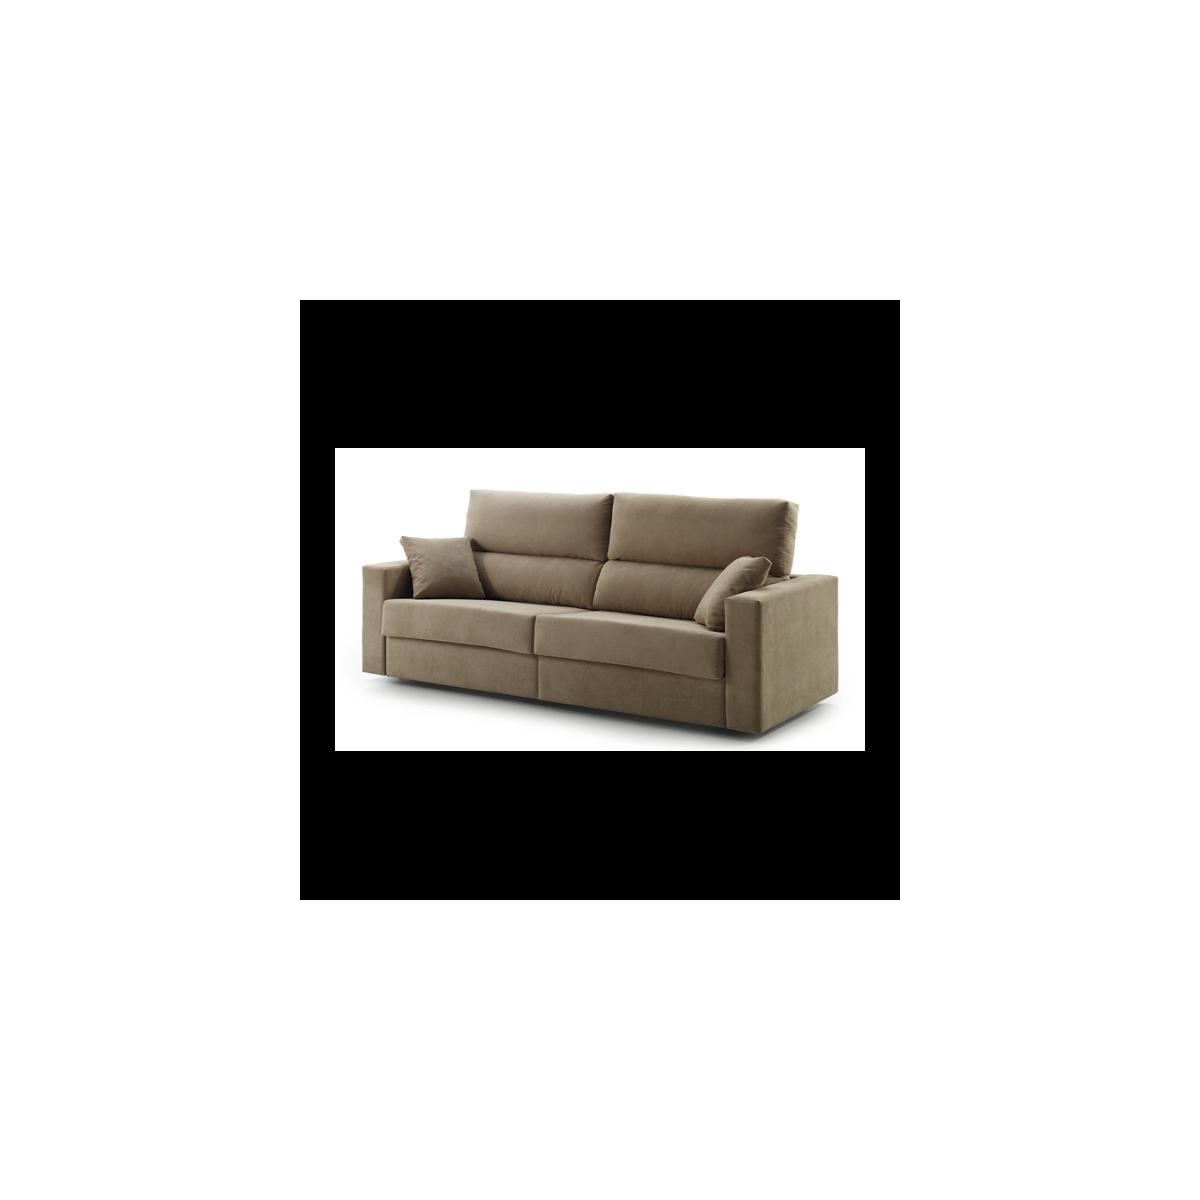 sof cama 3 plazas sistema italiano modelo carmen mubeko